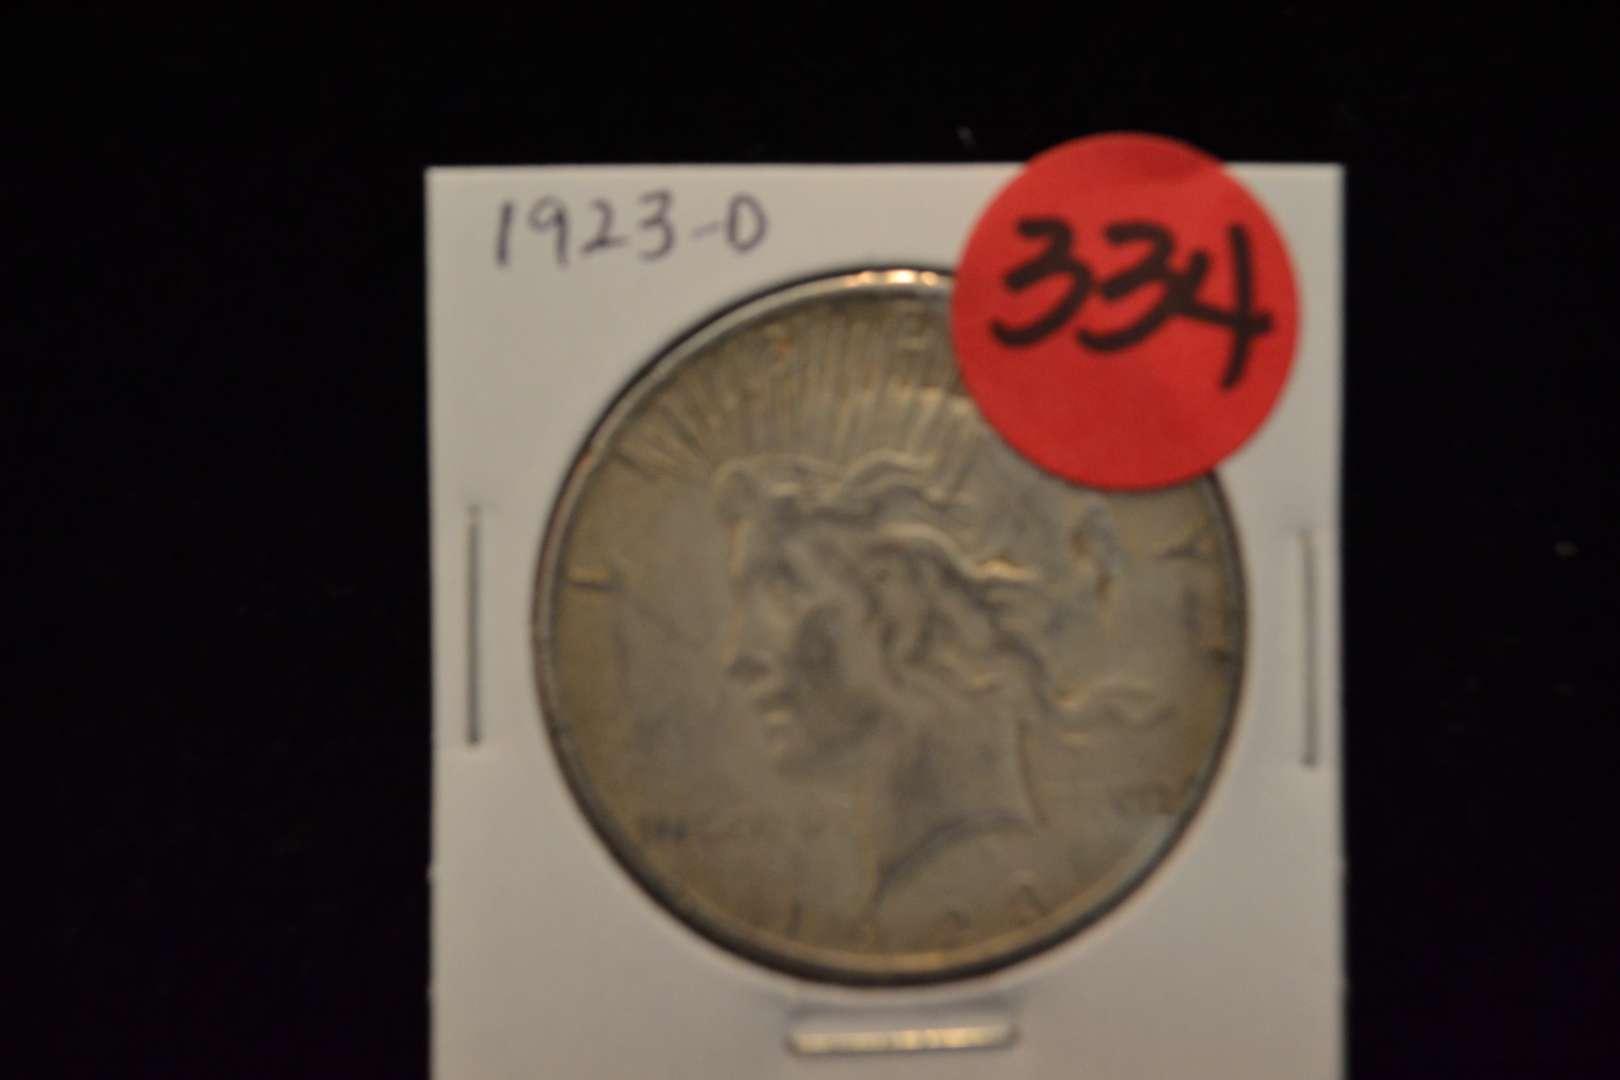 Lot # 334 1923-D SILVER PEACE DOLLAR